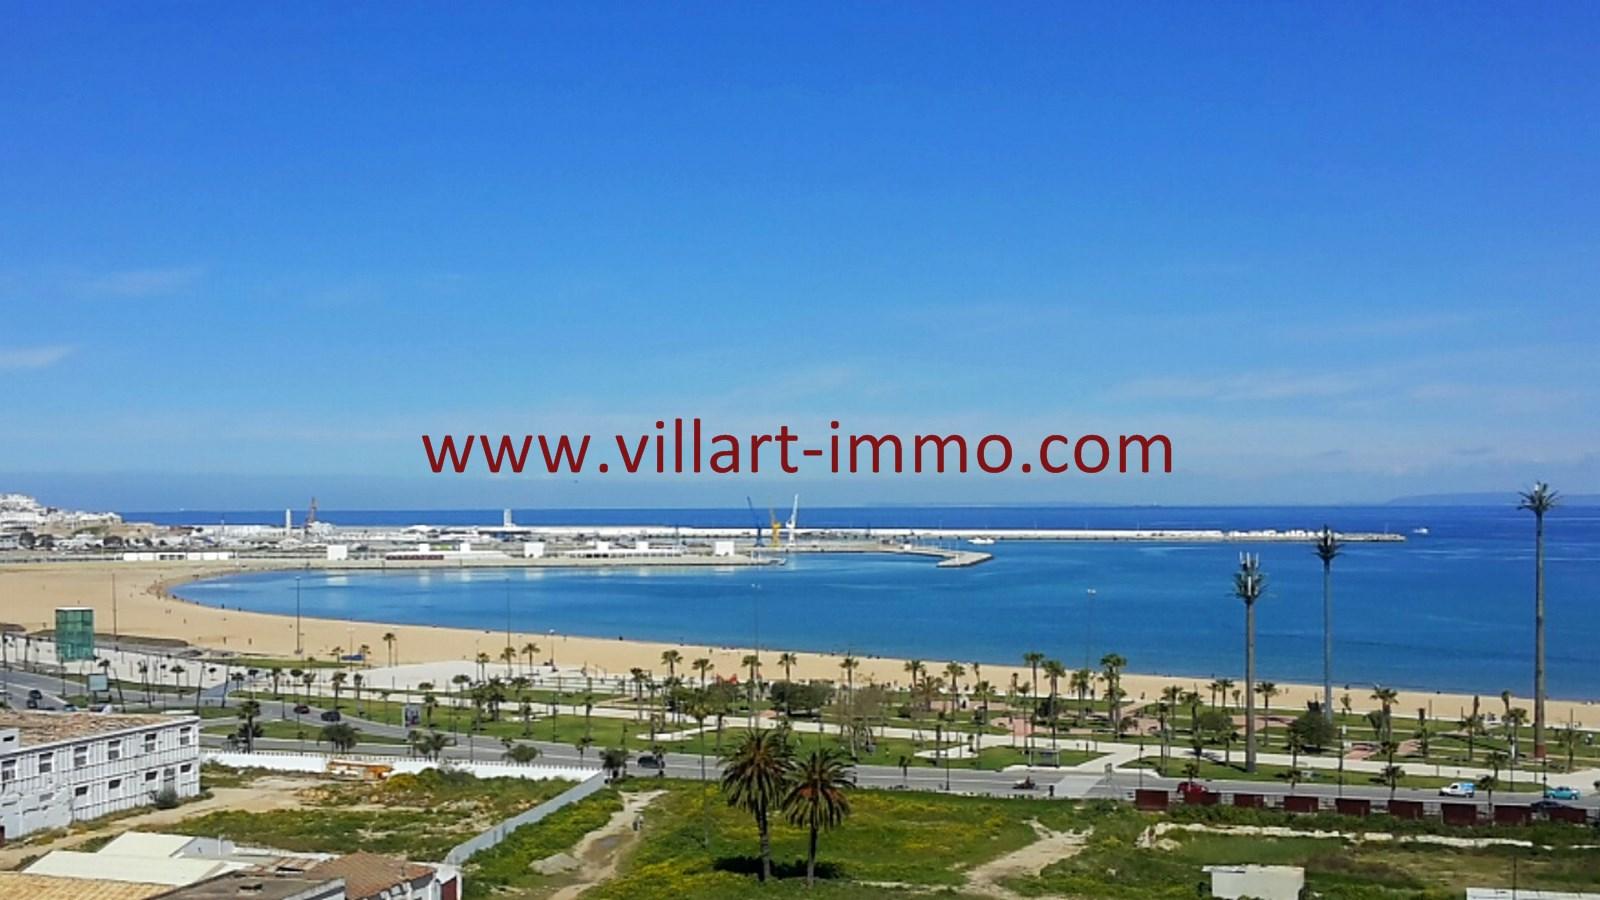 1-Vente-Appartement-Tanger-Malabata-Vue-VA490-Villart Immo (Copier)